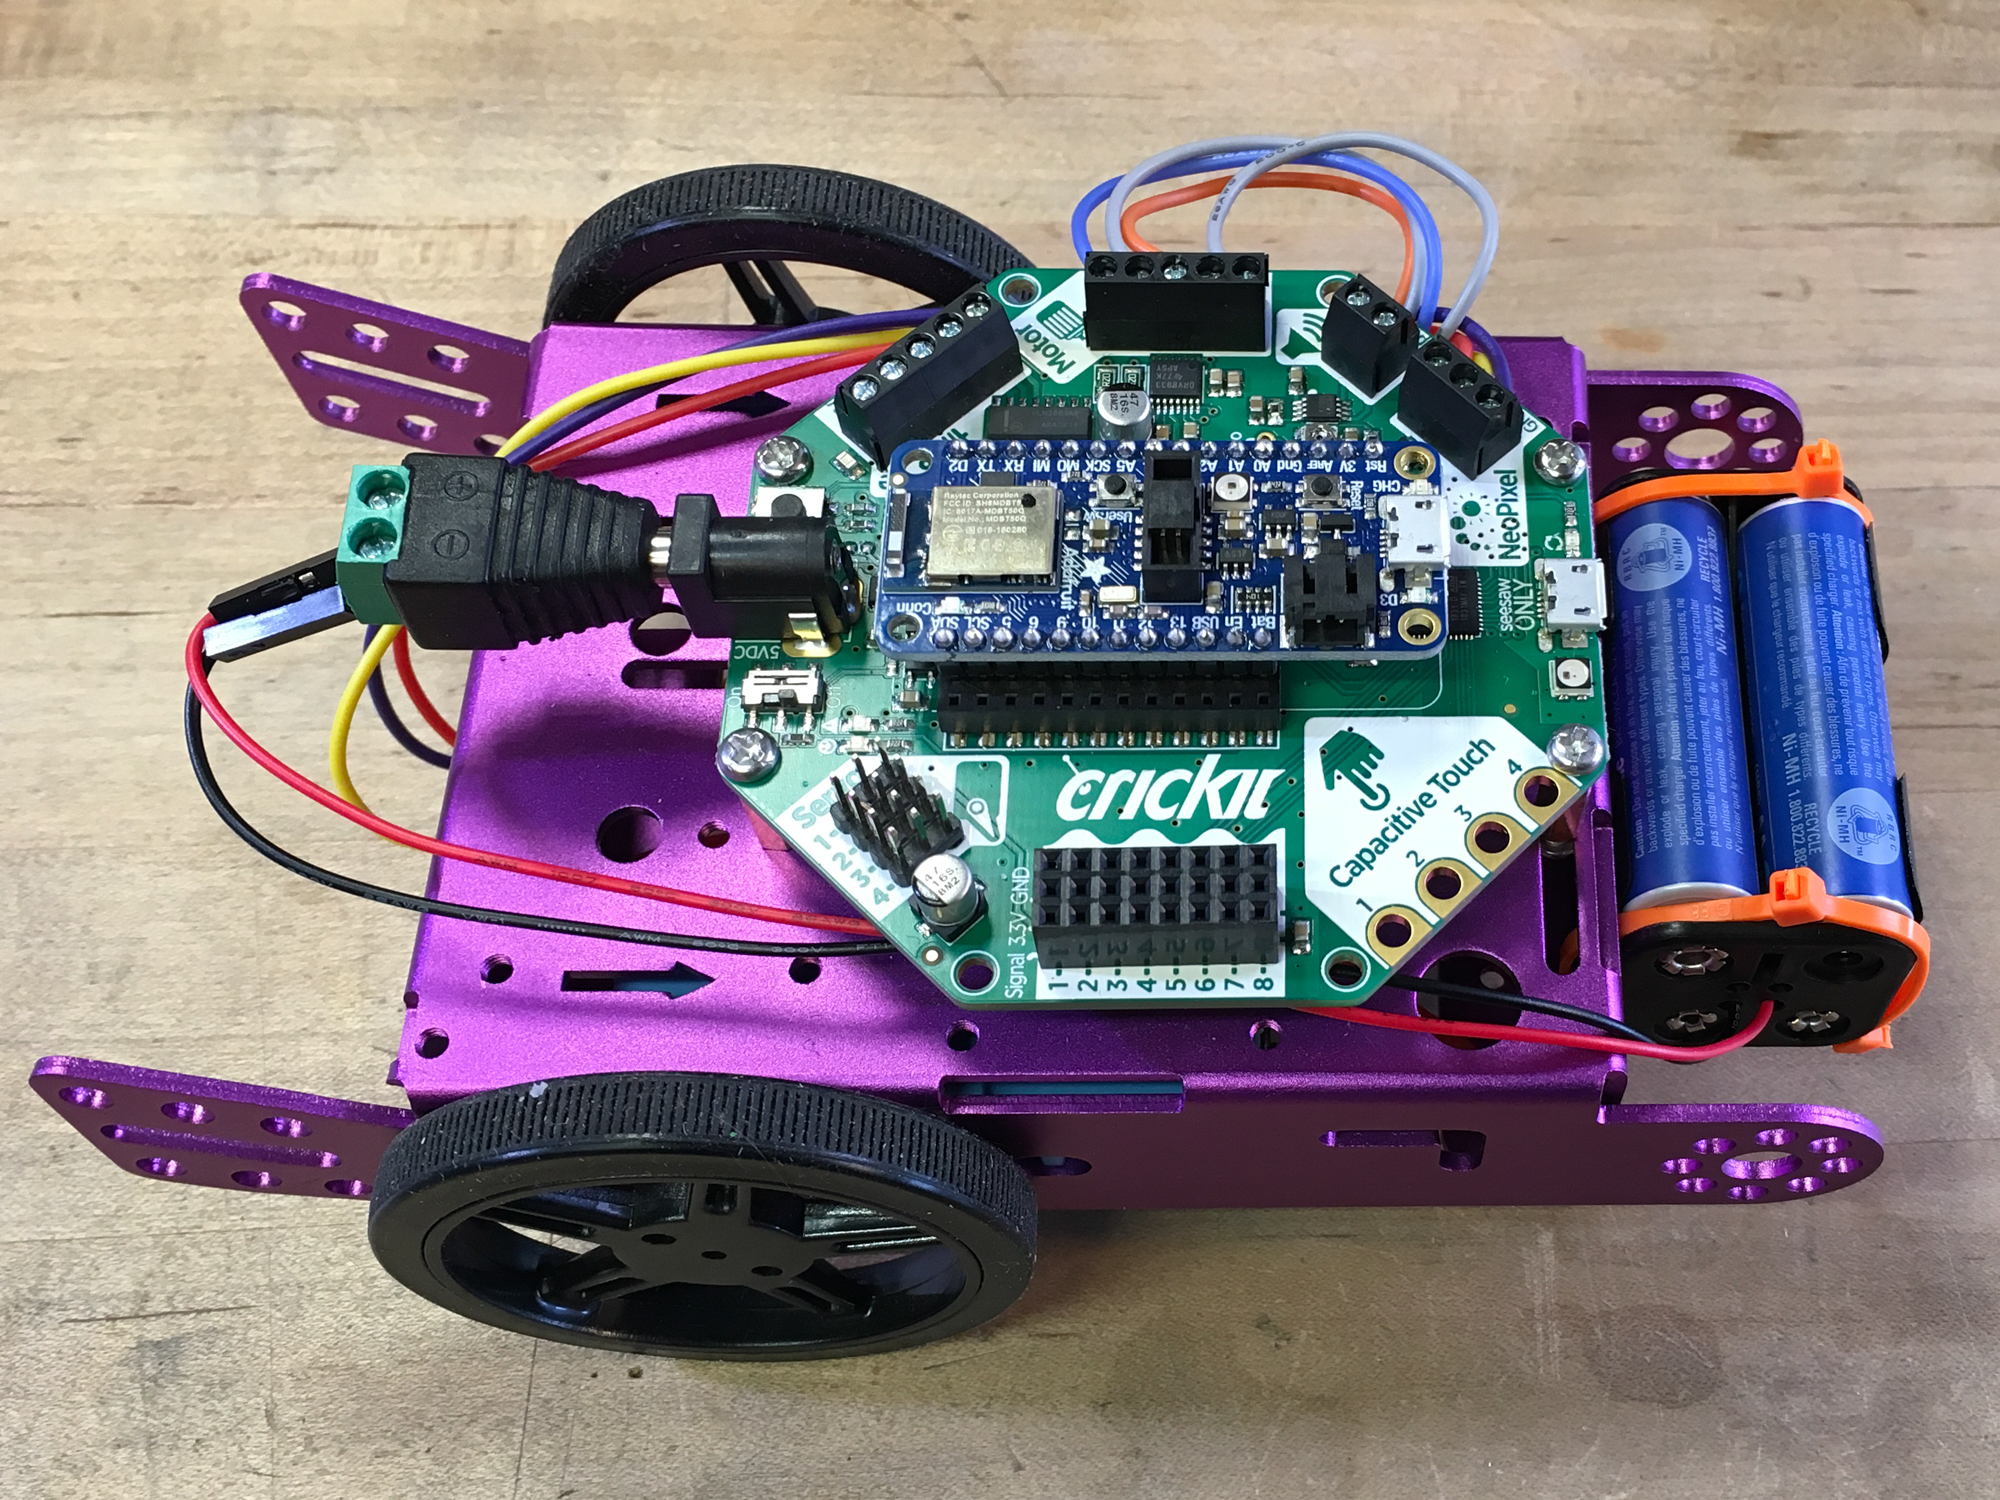 robotics___cnc_IMG_6583_2k.jpg